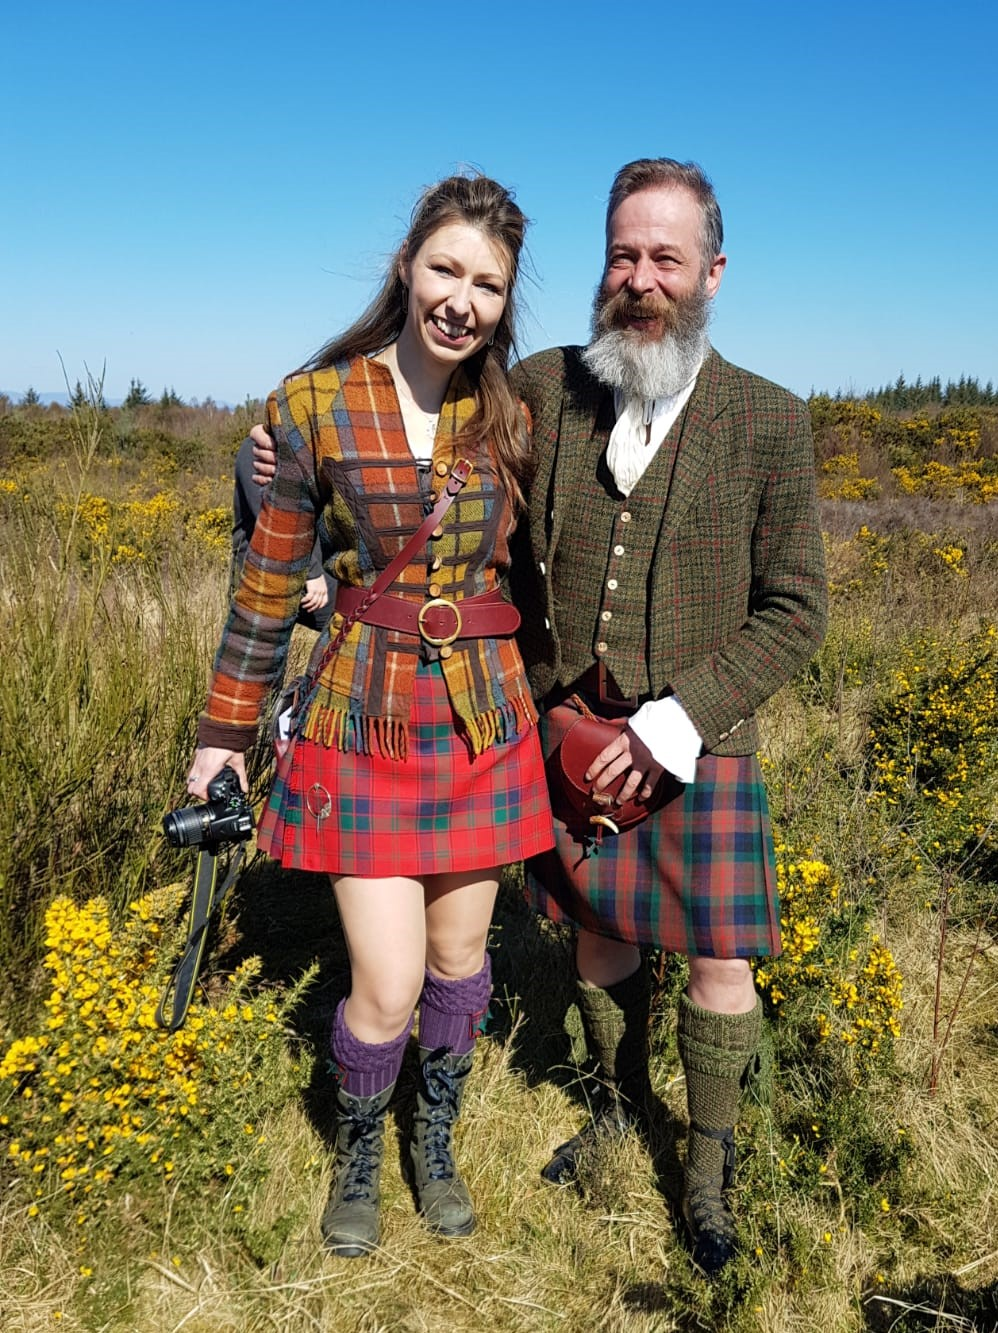 Handsewn made-to-measure kilts, handstitched leather Antler Sporran and Leather Kilt belt, Robertson tartan kilt, MacDuff Tartan kilt, Tweed kilt jacket and waistcoat, House of Cheviot socks, Culloden, Scotland